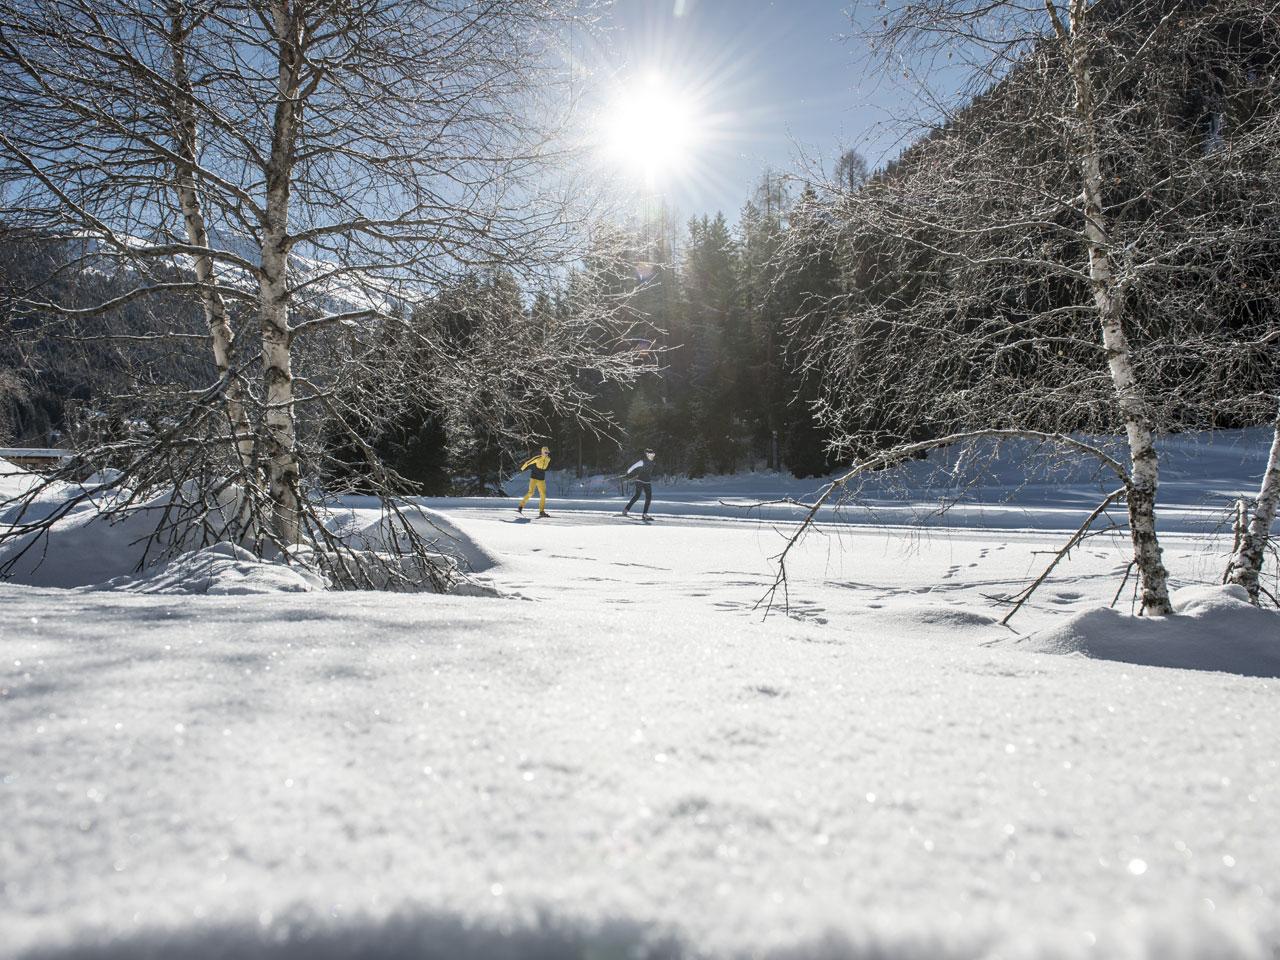 Langlaufen Davos Klosters